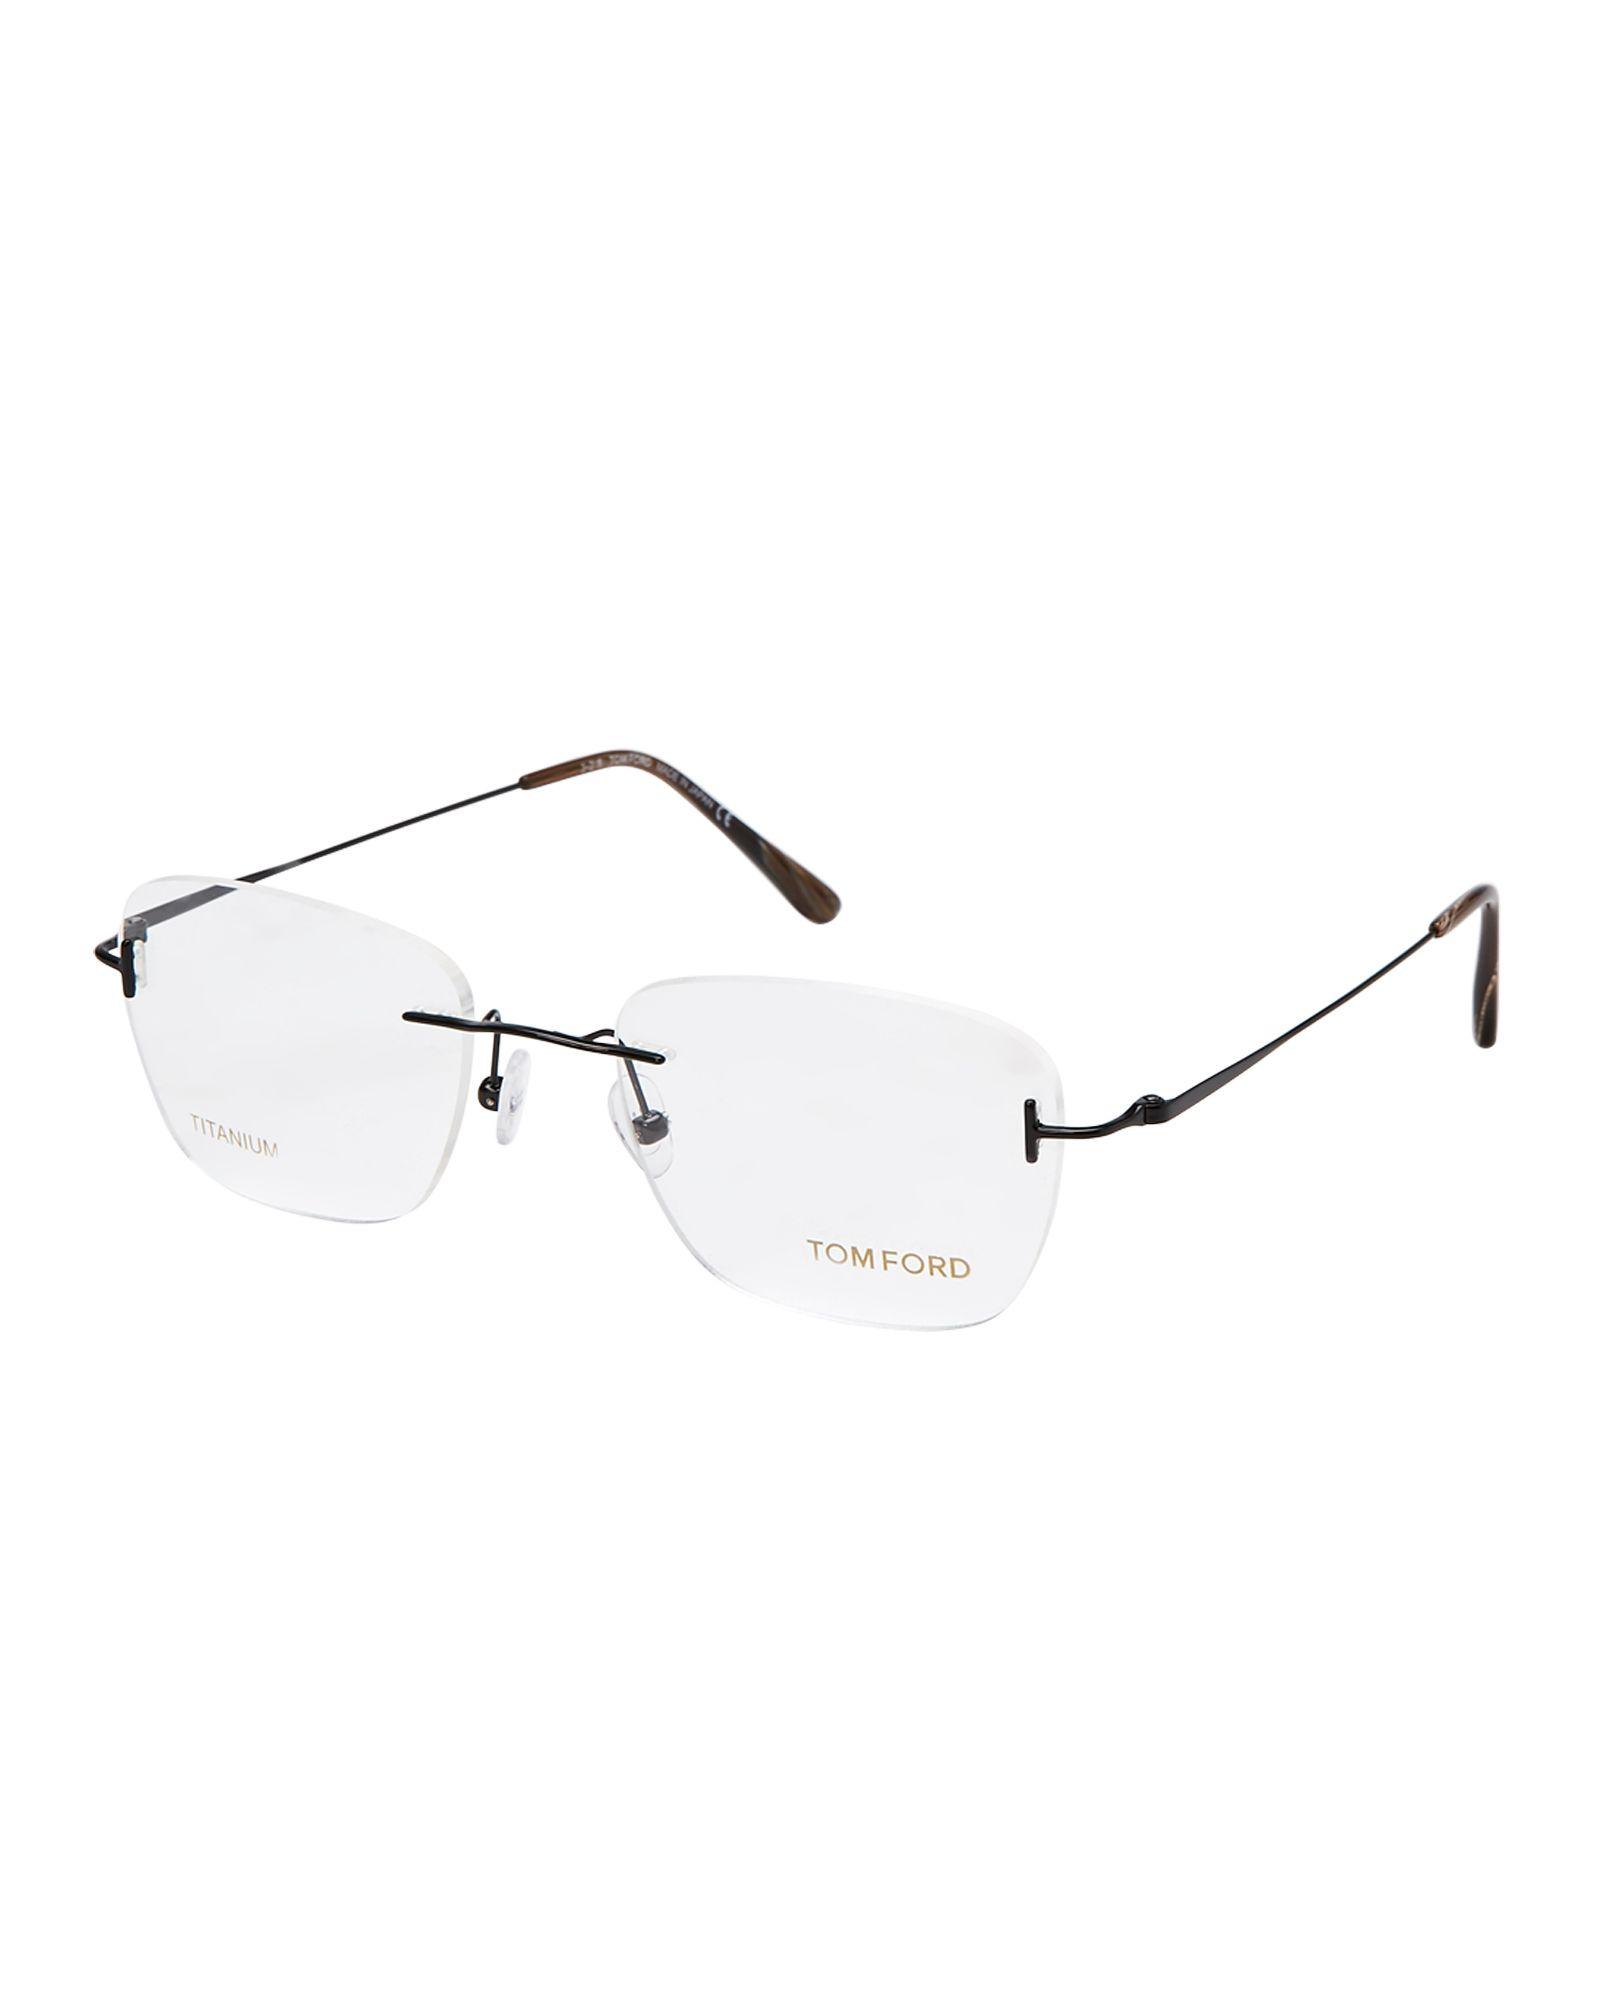 FT5495 Rimless Square Optical Frames